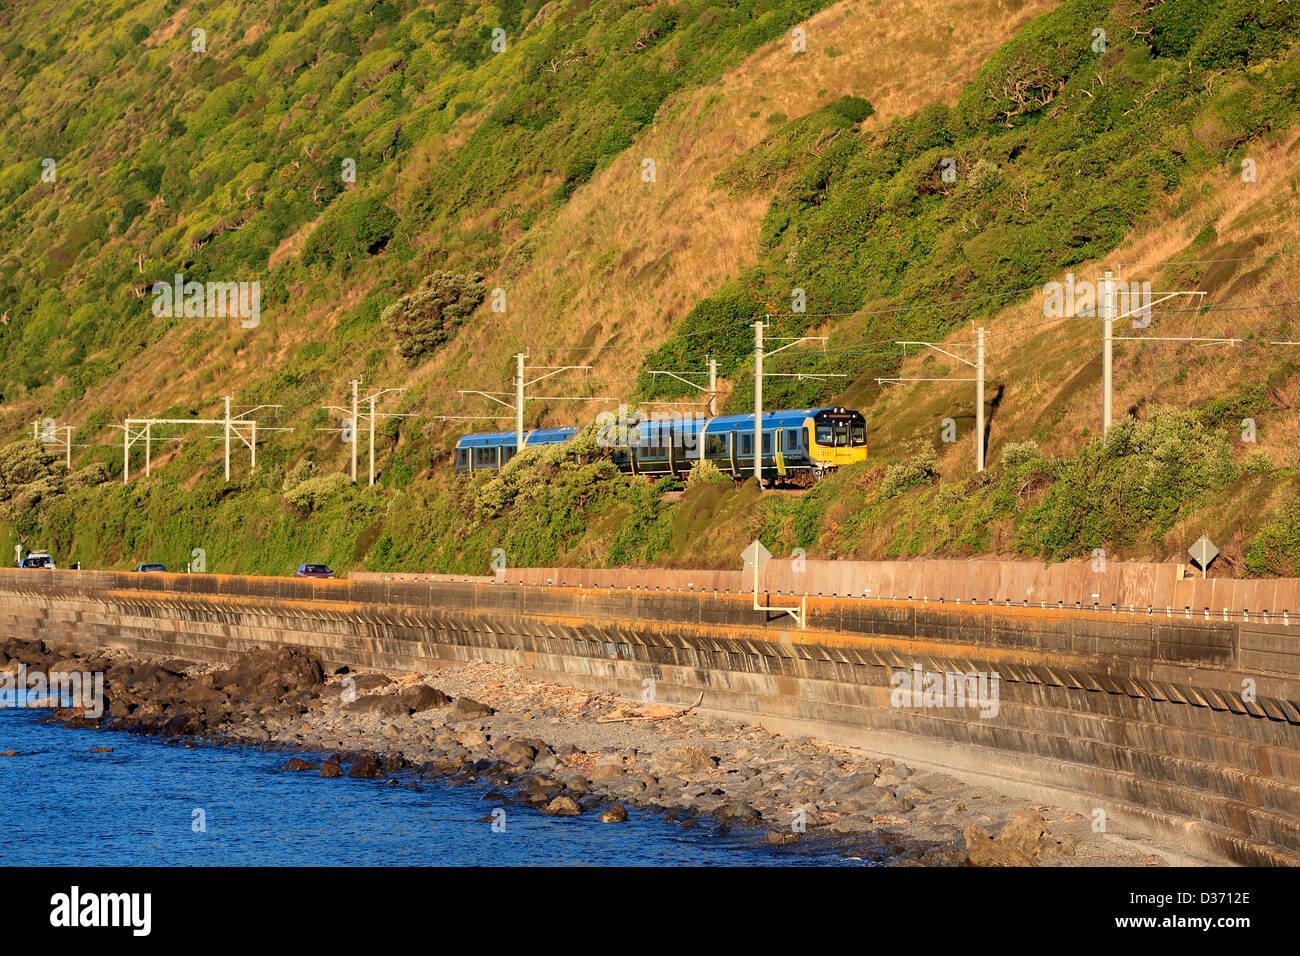 The Metlink Kapiti line train on the Kapiti coast highway between pukerua Bay and Paekakariki. Stock Photo